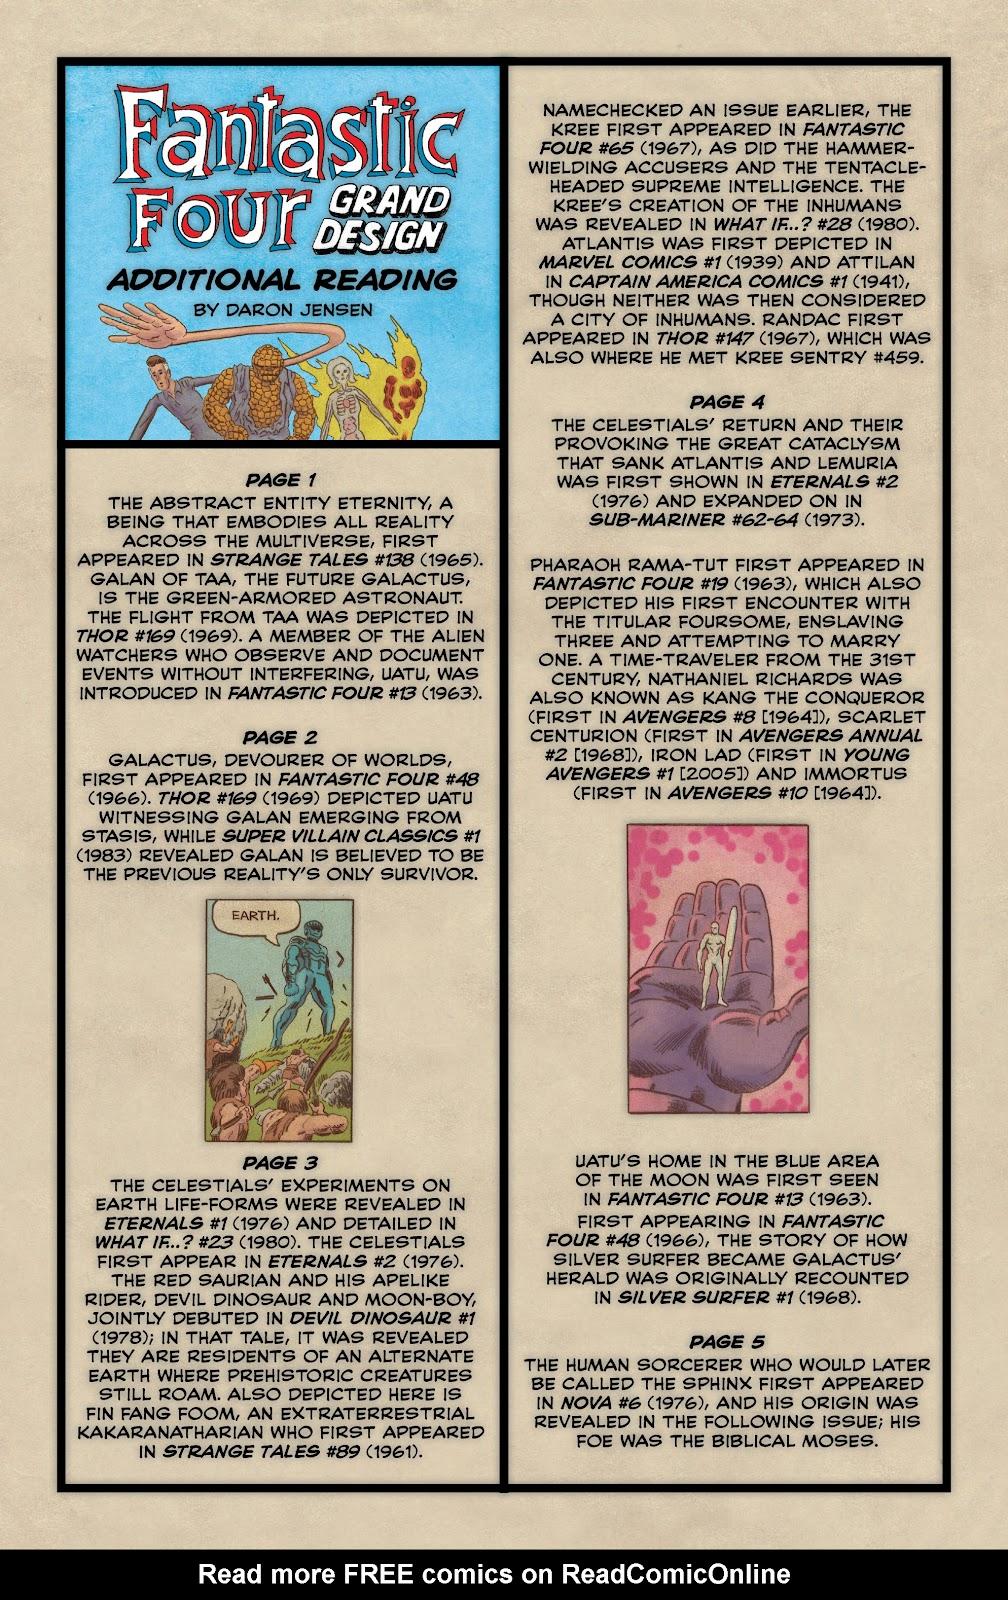 Read online Fantastic Four: Grand Design comic -  Issue #1 - 43